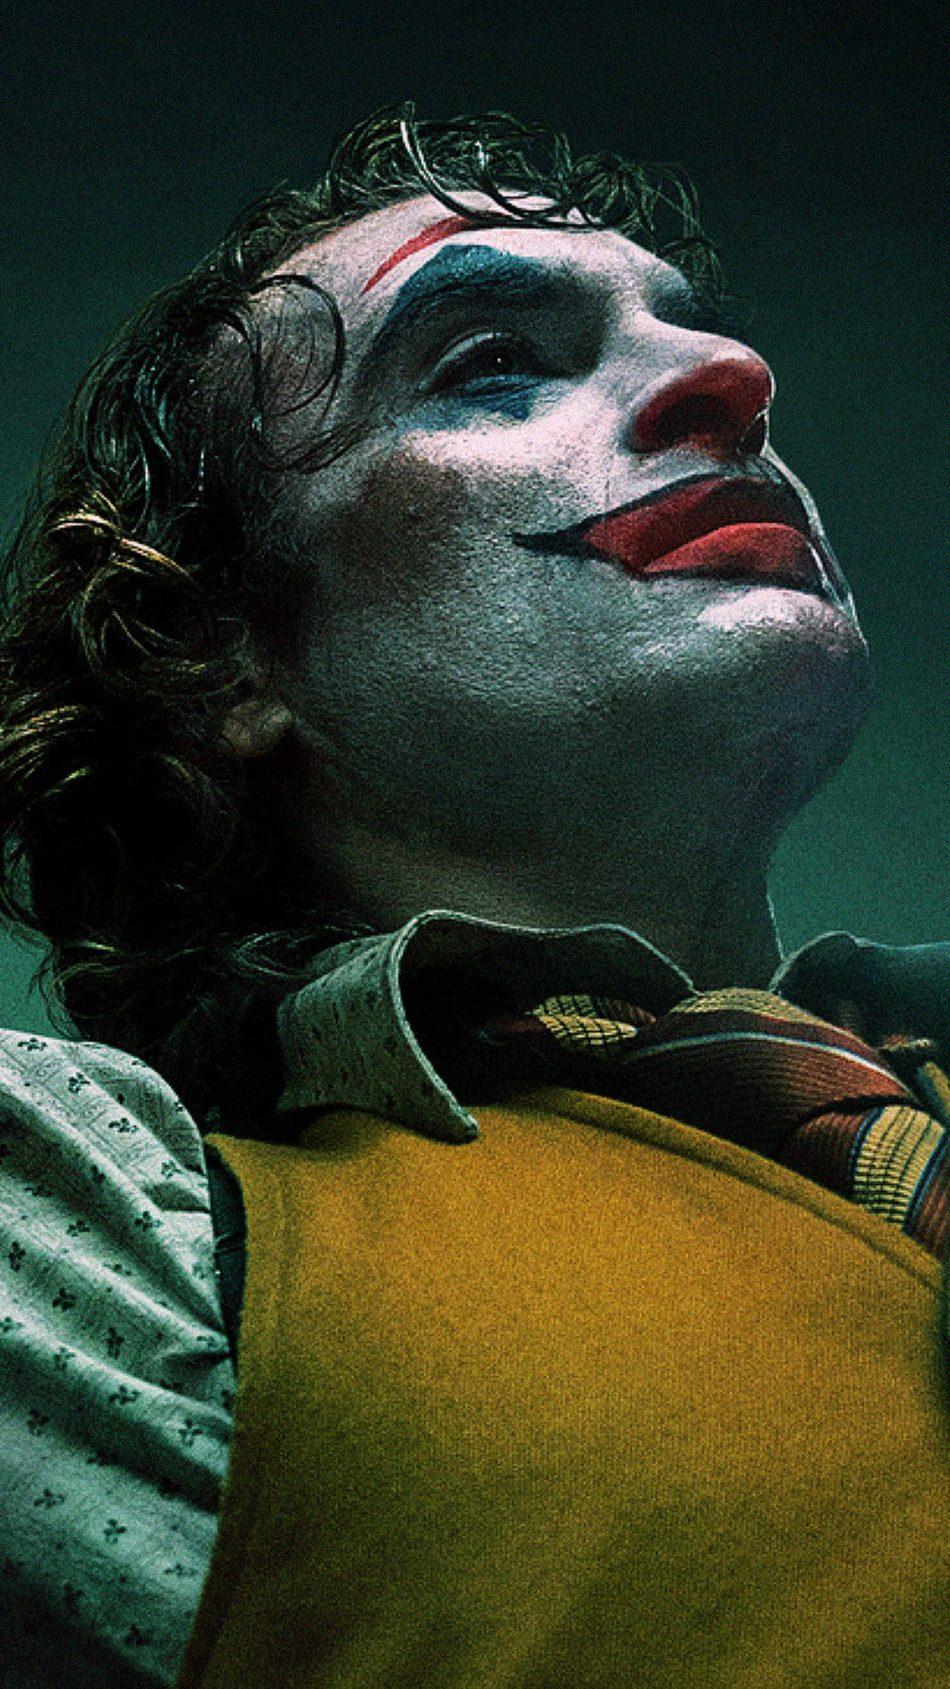 Download Joaquin Phoenix Joker 2019 Movie Free Pure 4k Ultra